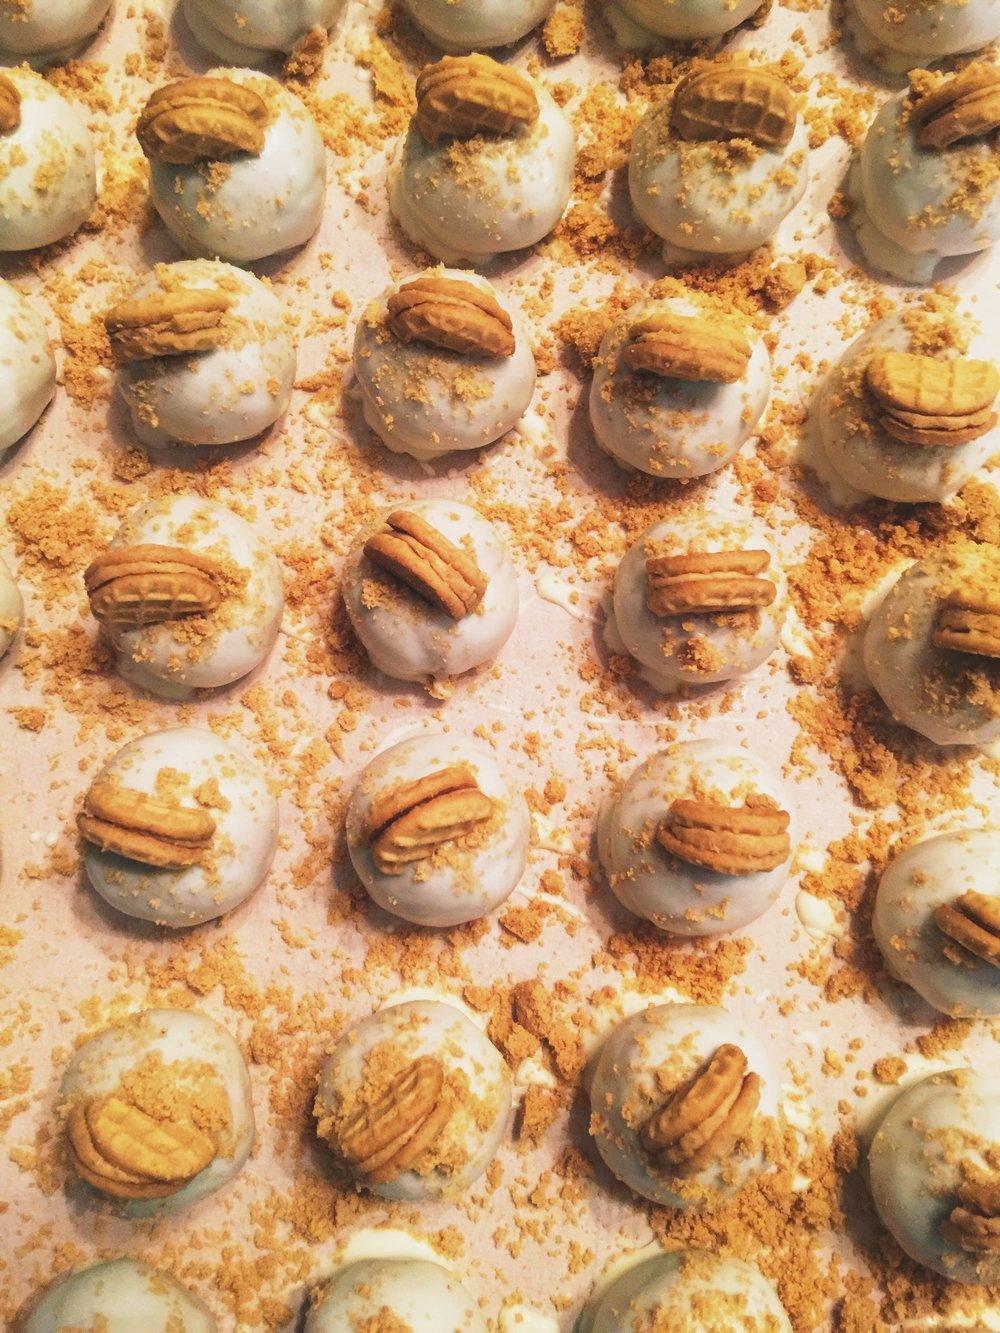 West Carrollton Nutter Butter Cookie Truffles